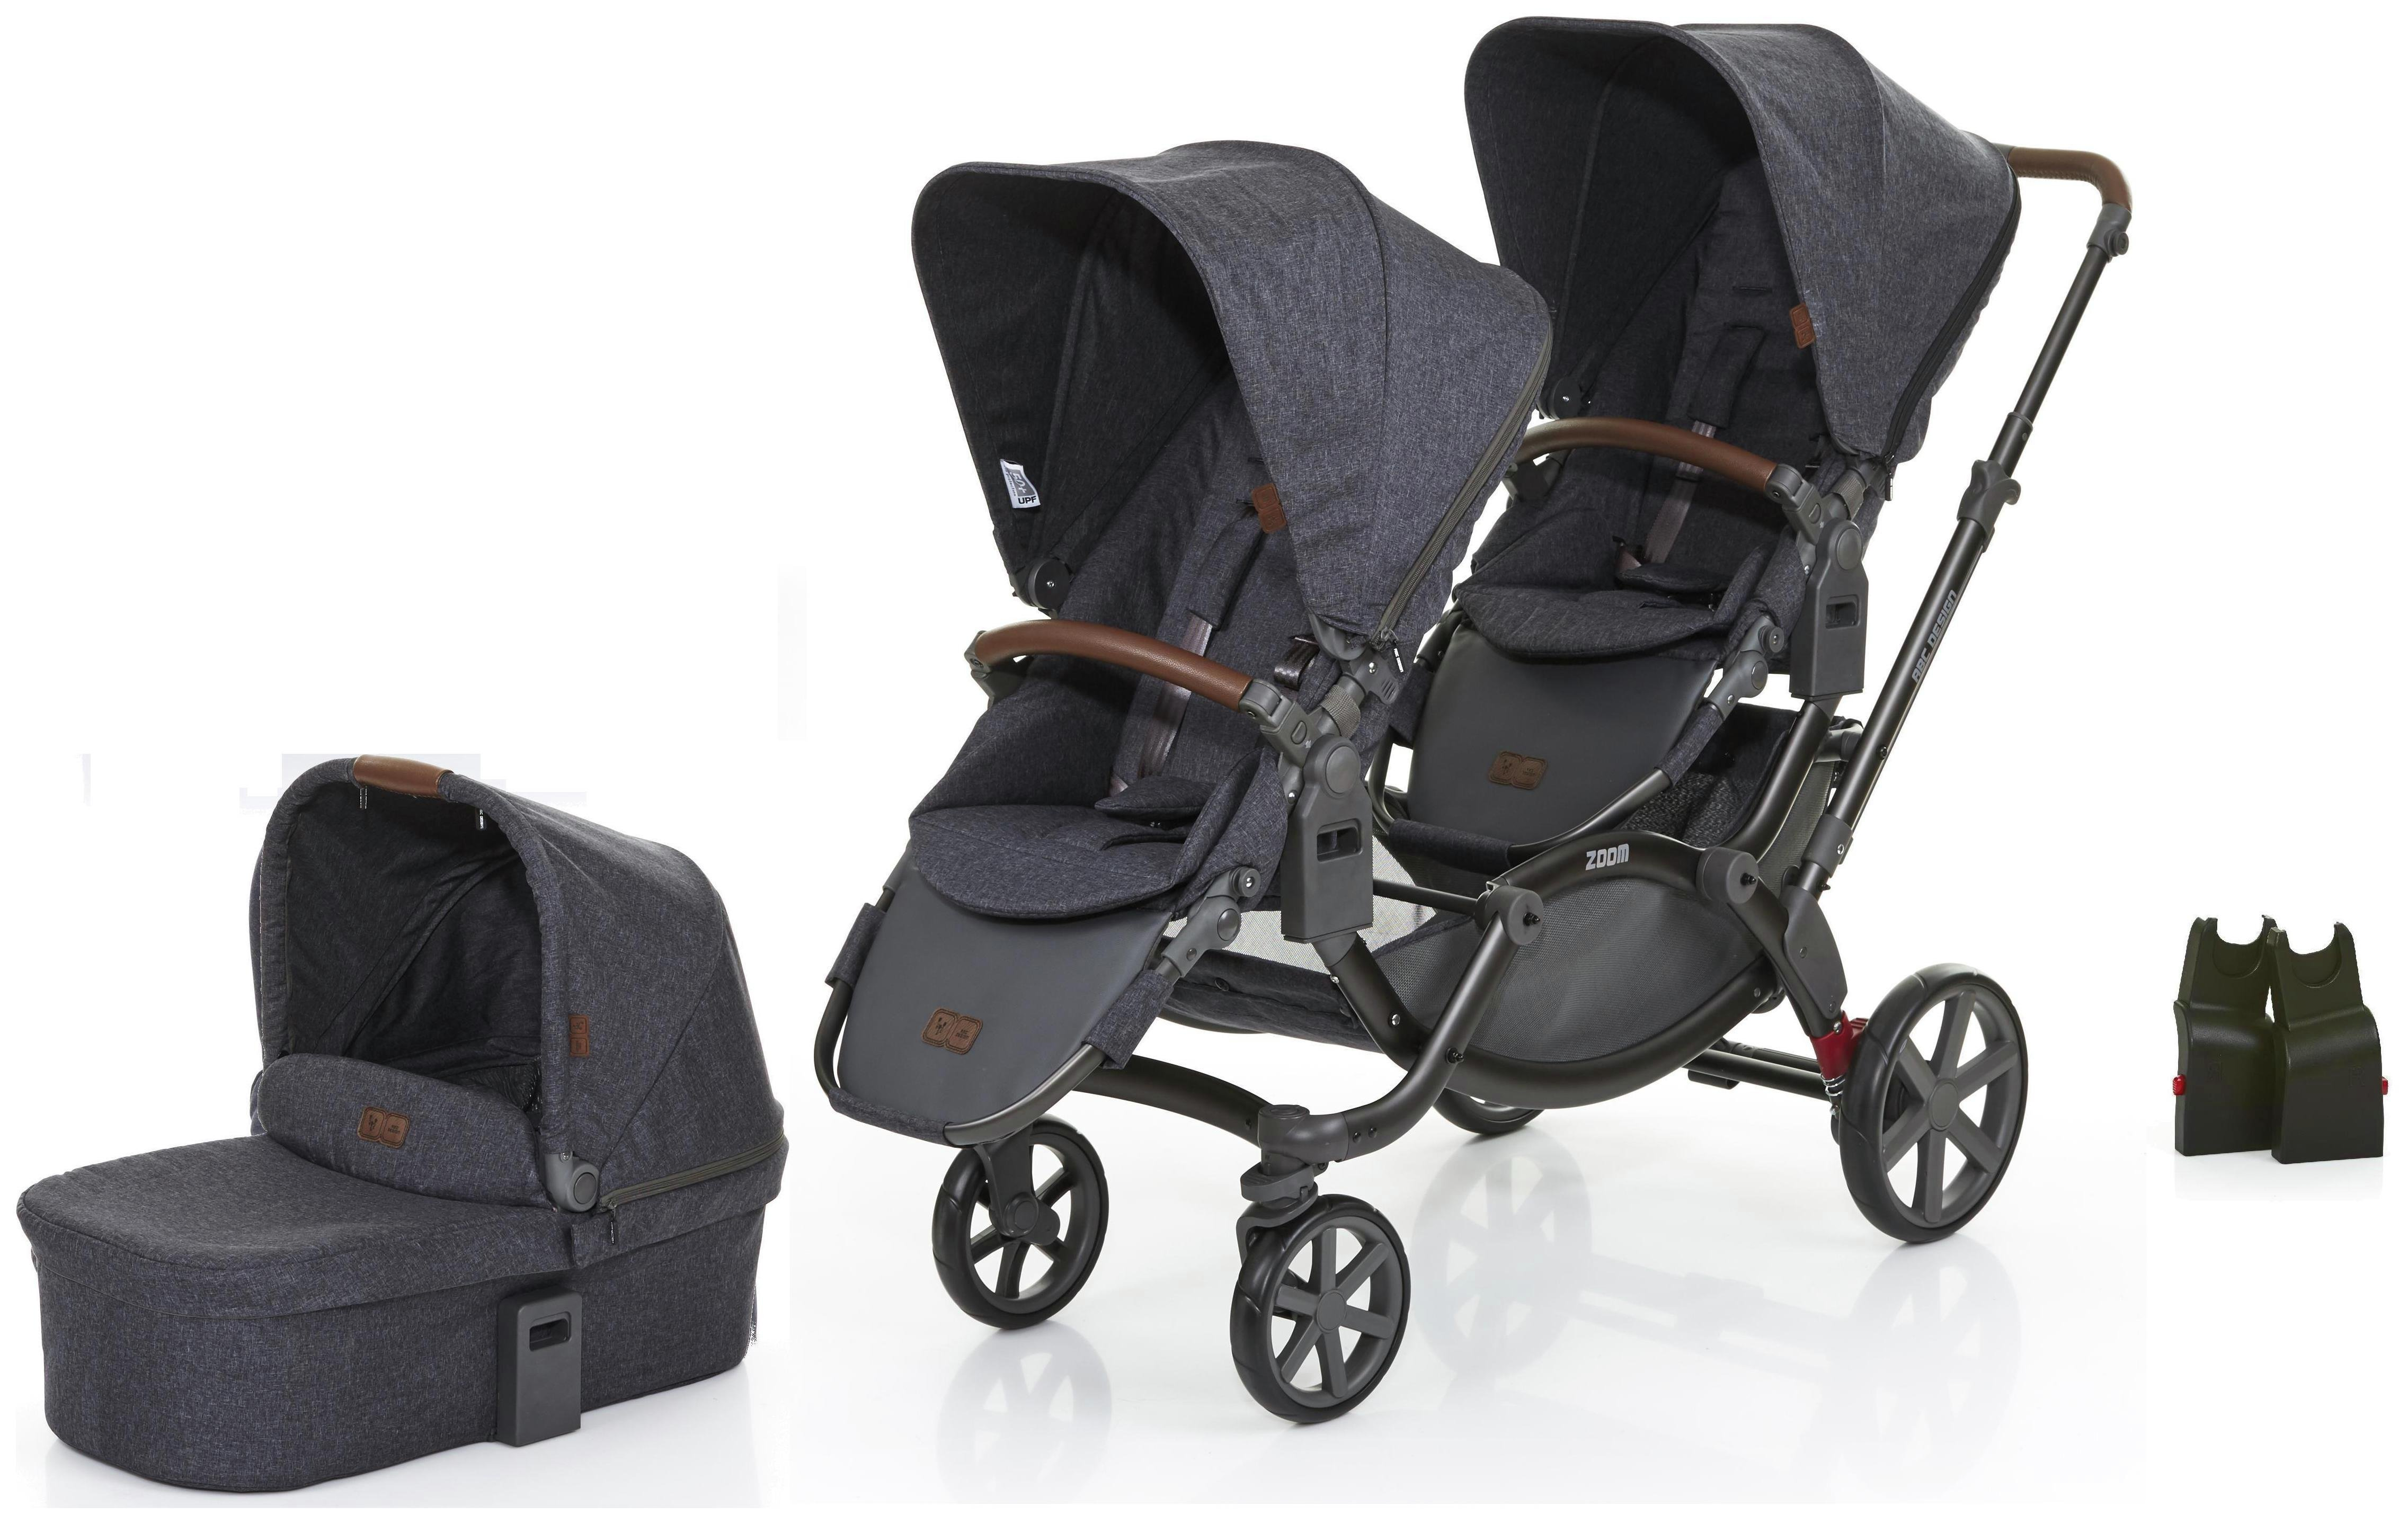 Image of ABC Design Zoom Tandem, Carrycot & 1 Car Seat Adaptors